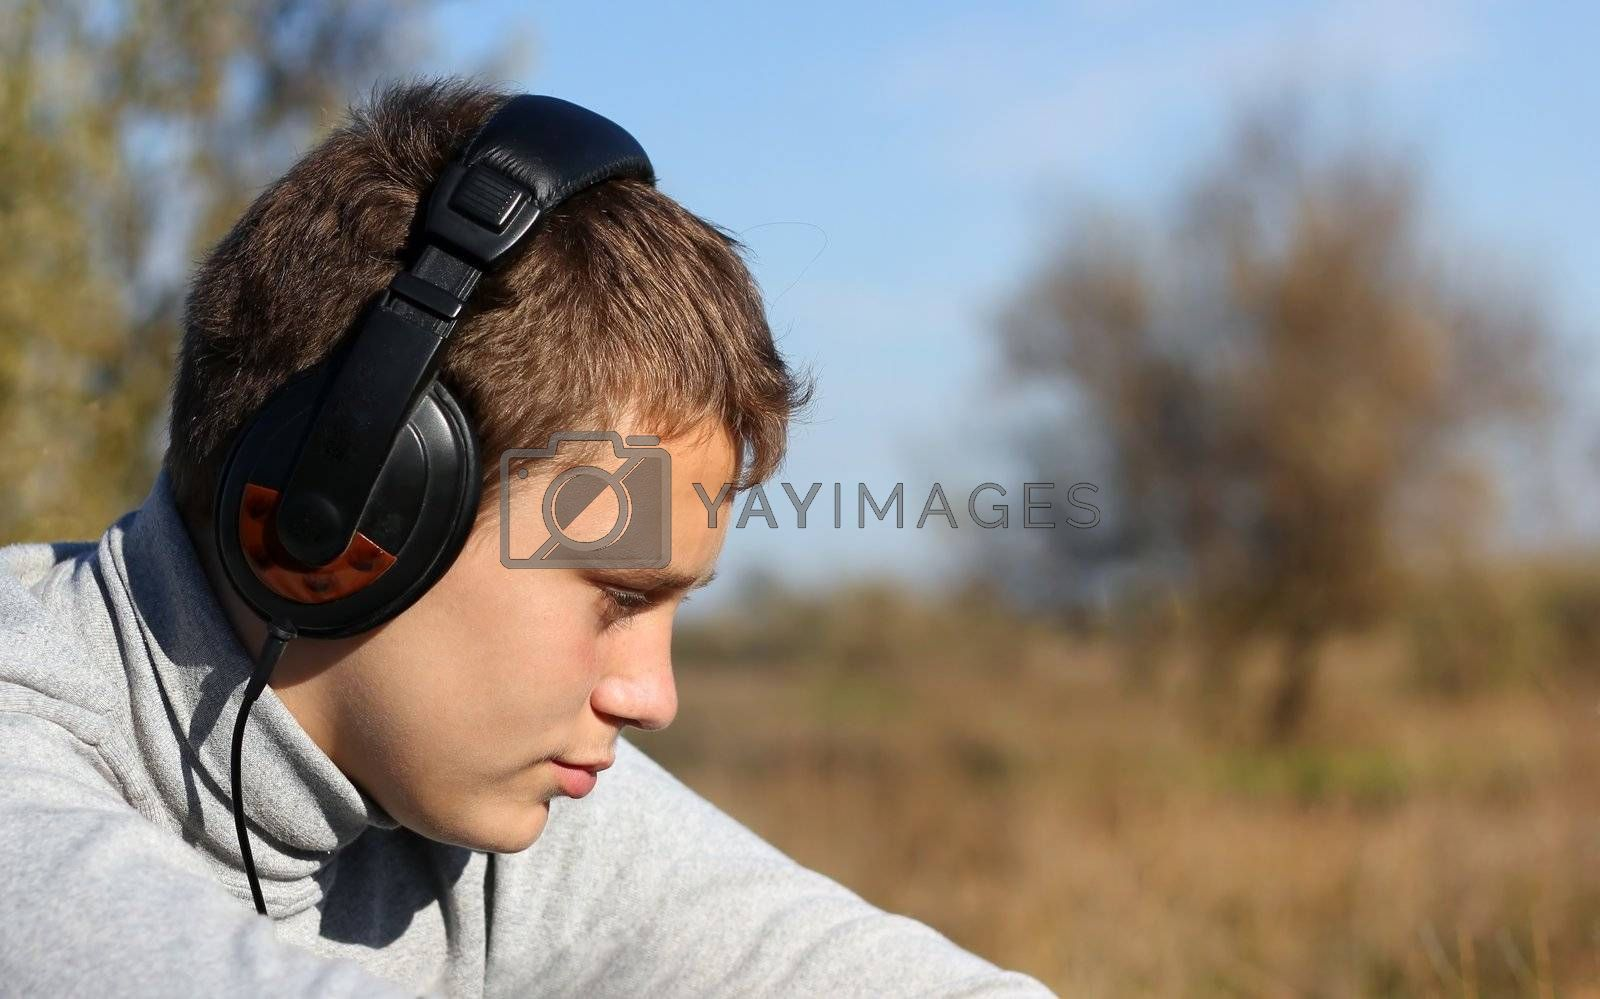 Boy Enjoying Music in headphones in autumn day